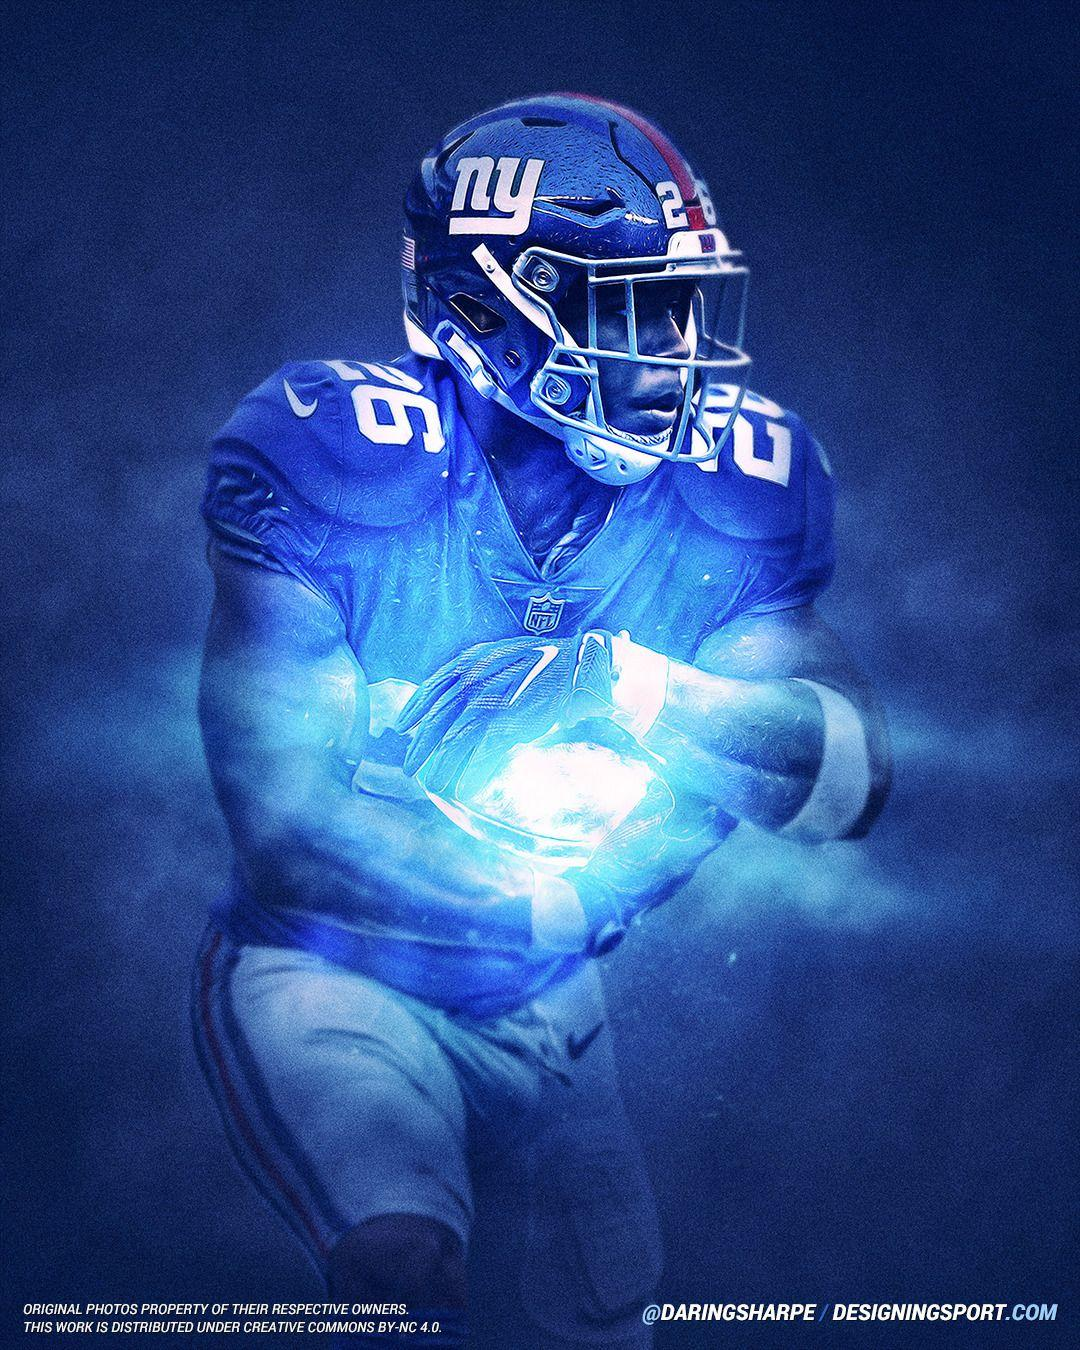 Saquon Barkley New York Giants Wallpapers 1080x1350